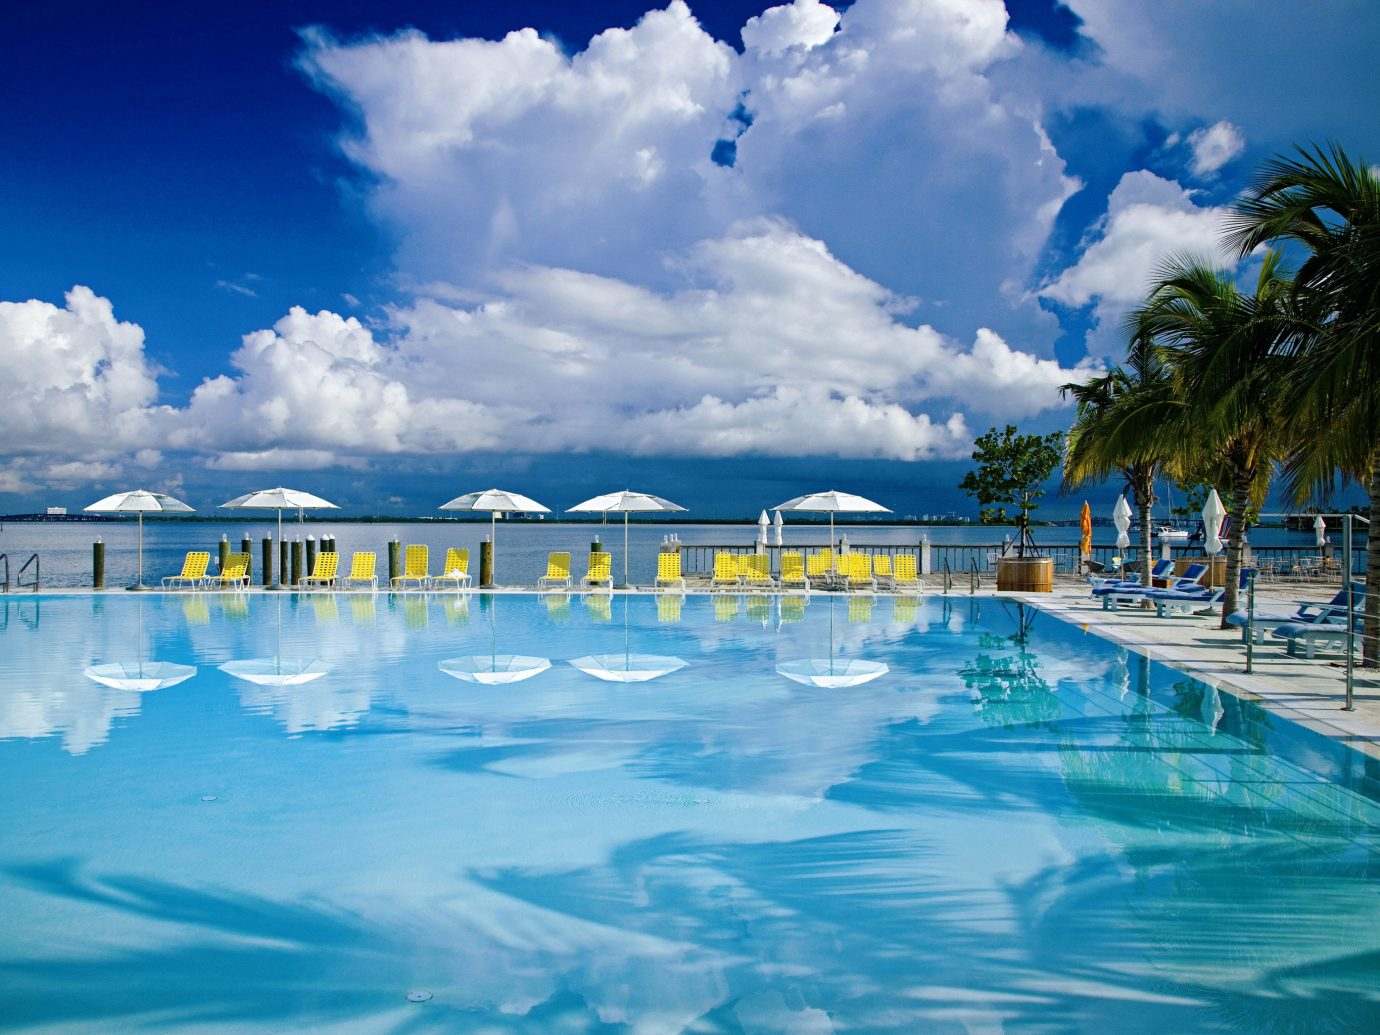 Trip Ideas sky outdoor swimming pool leisure Resort Pool Ocean vacation Sea Lagoon resort town blue estate reflection caribbean swimming day